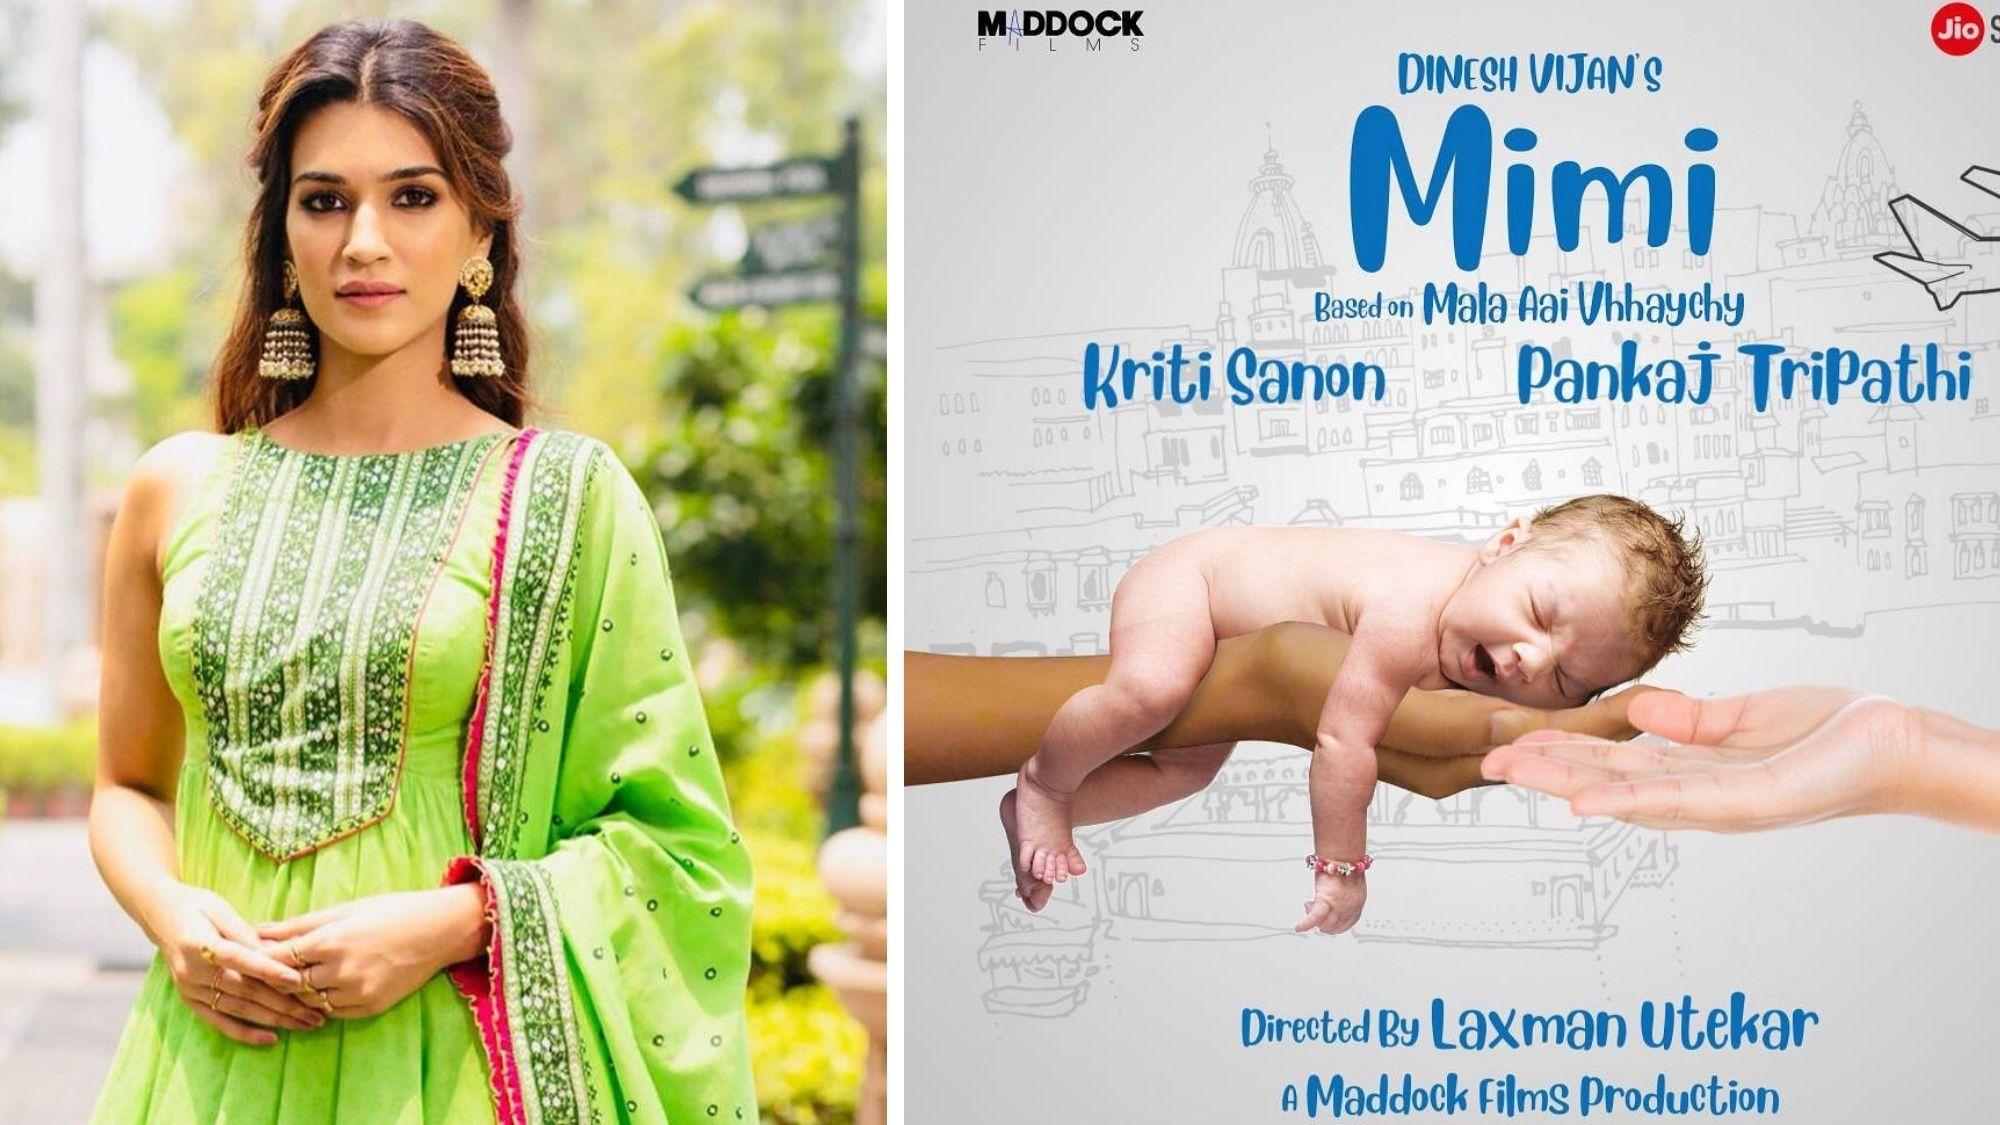 Kriti Sanon Shares Poster of 'Mimi', a Film Based on Surrogacy